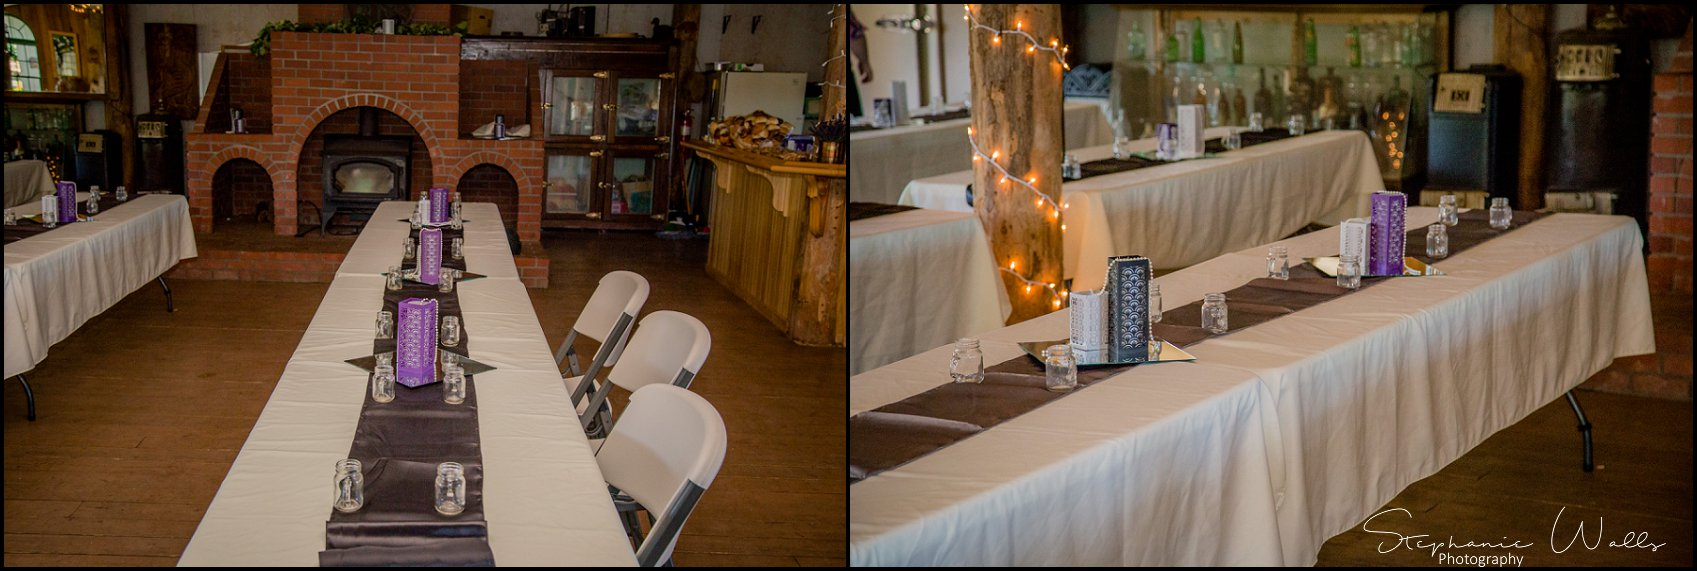 Everist Wedding 064 Patti & Bobbys | Troll Haven Castle & Bandy Farms | Sequim, Wa Wedding Photographer